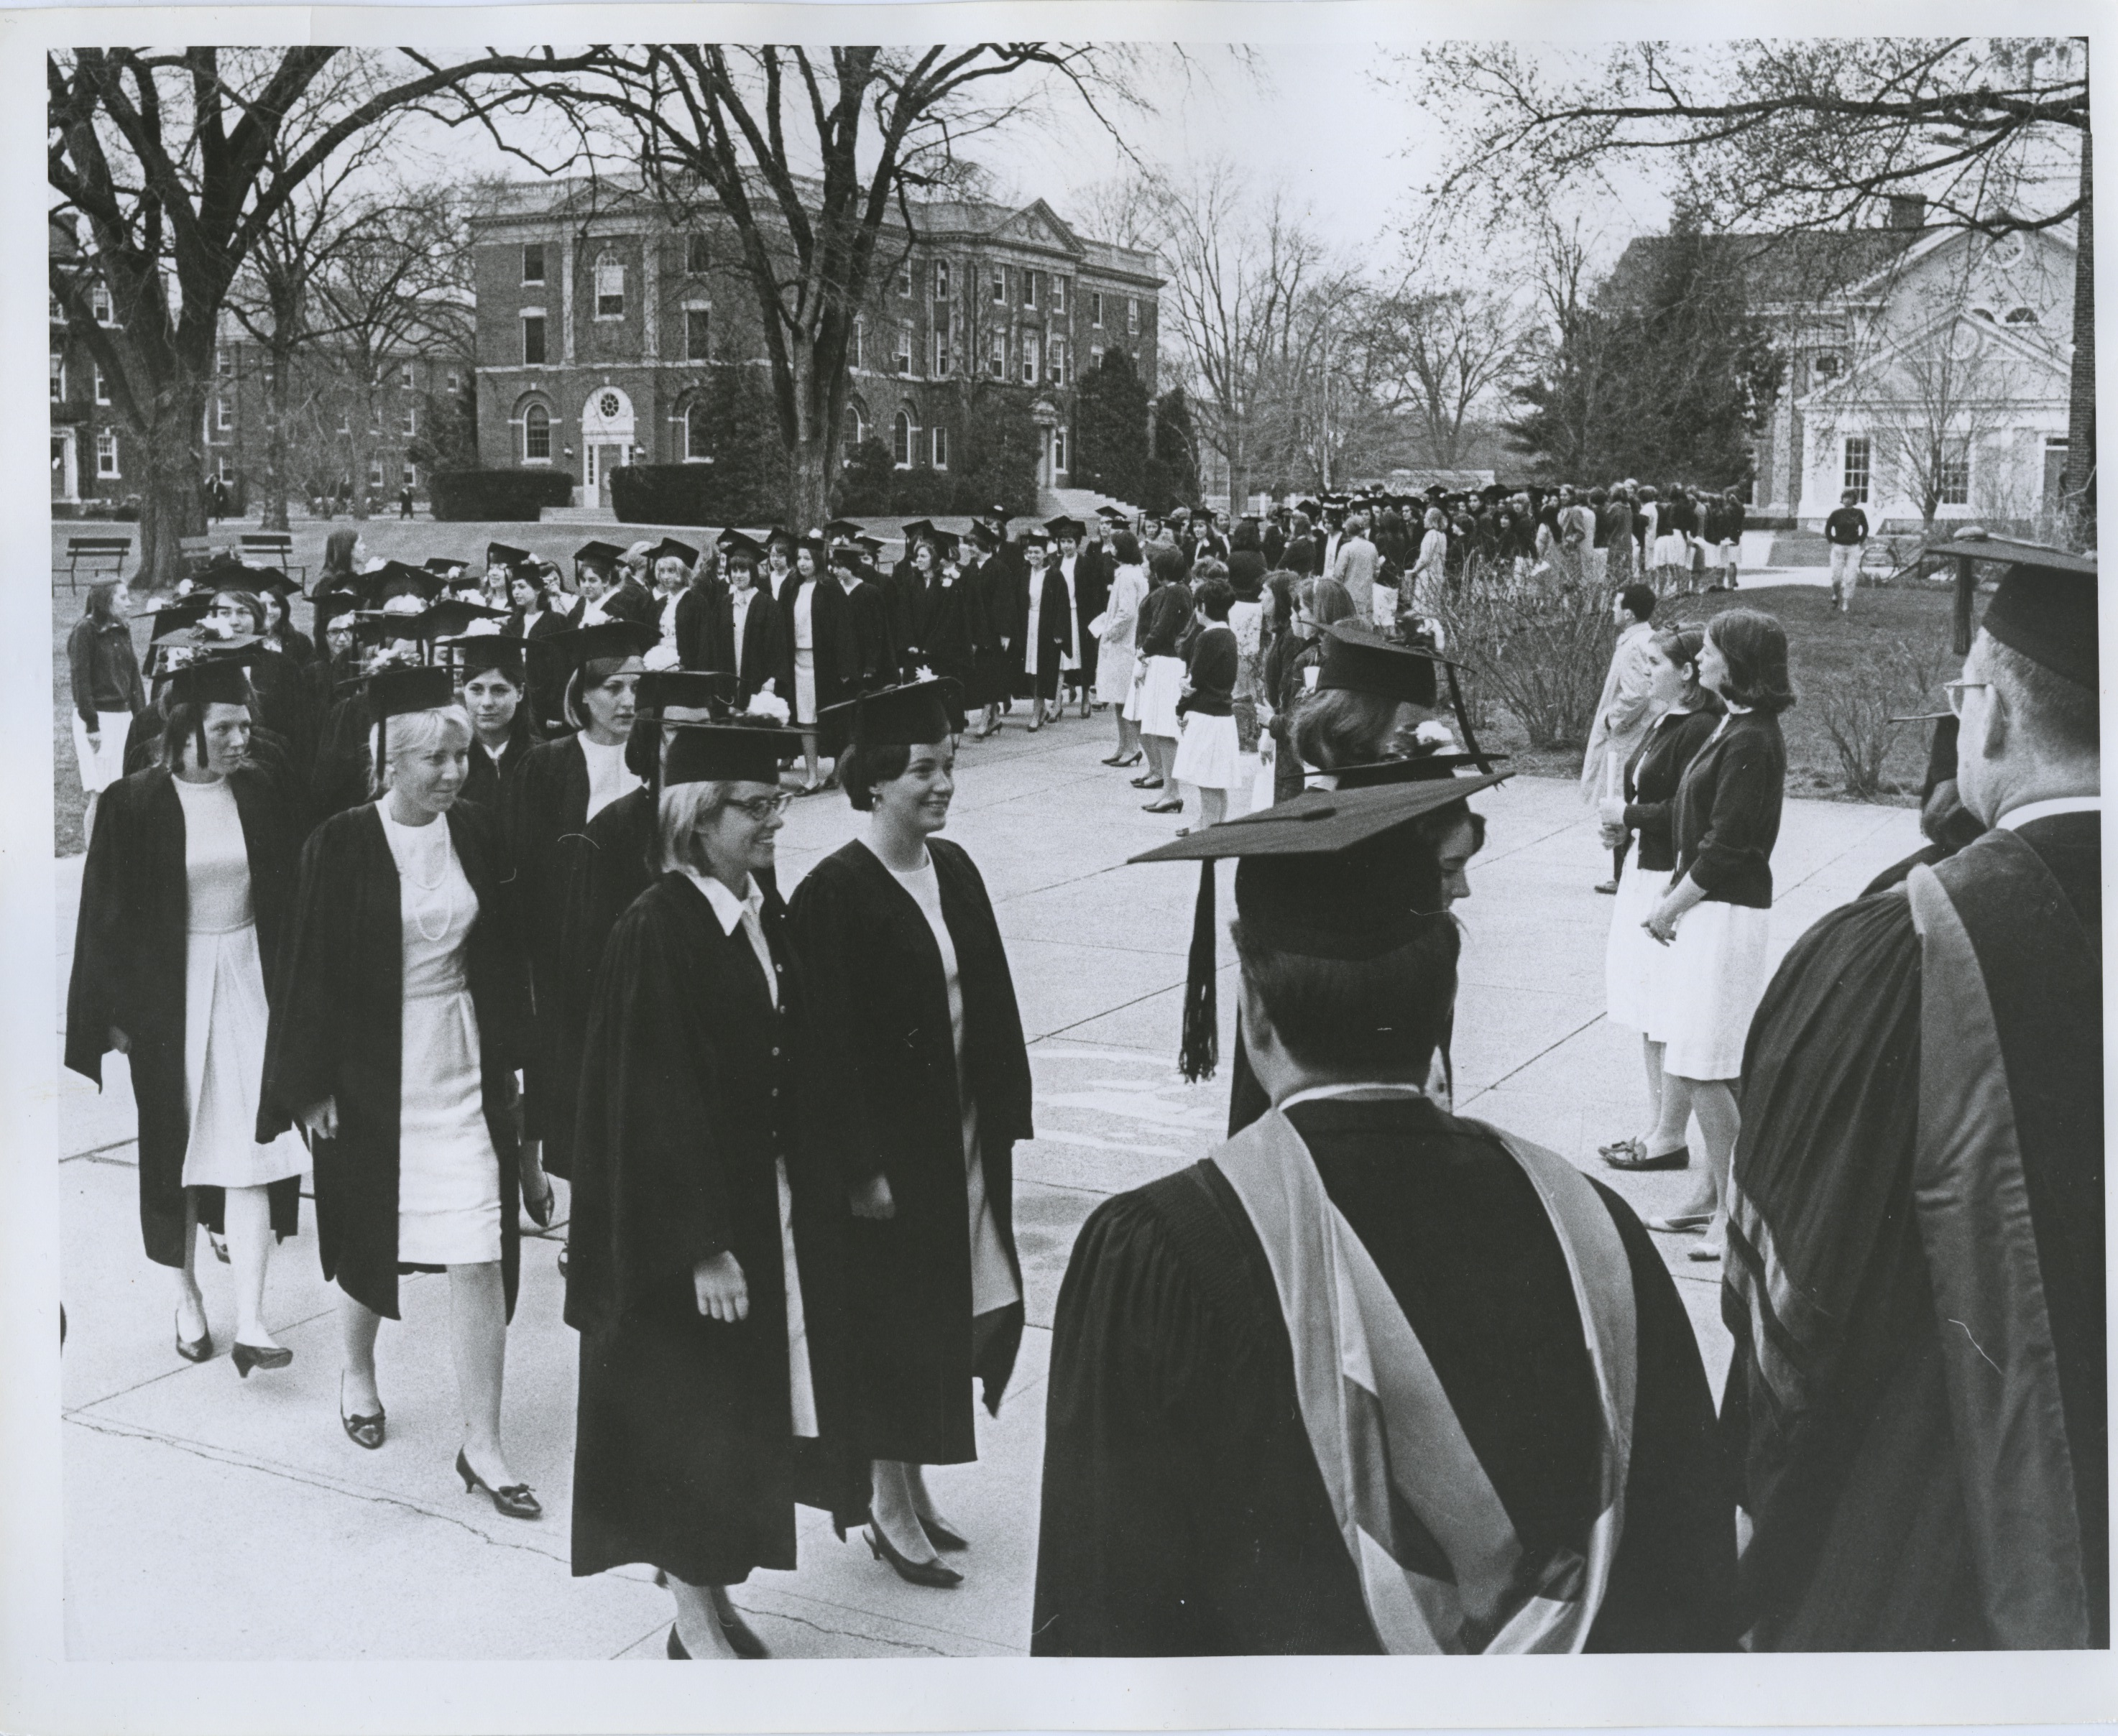 Class of 1966 Proceeding Into Chapel for Graduation Ceremony